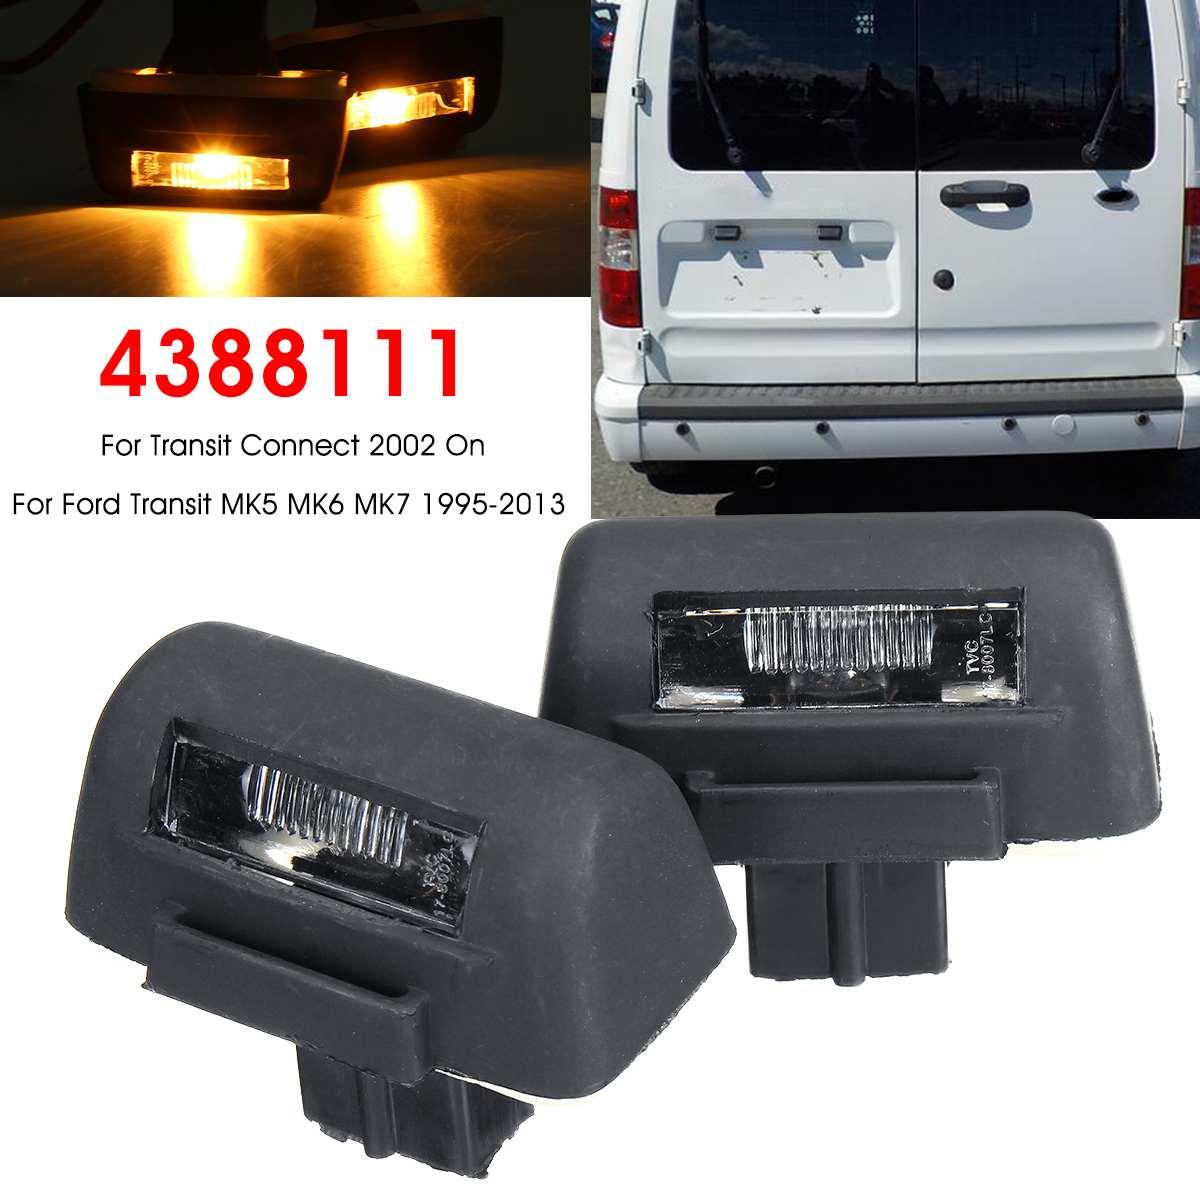 1 Pair Car Tail Rear Back License Plate Light Lamp For Ford Transit MK5 MK6 MK7 4388111